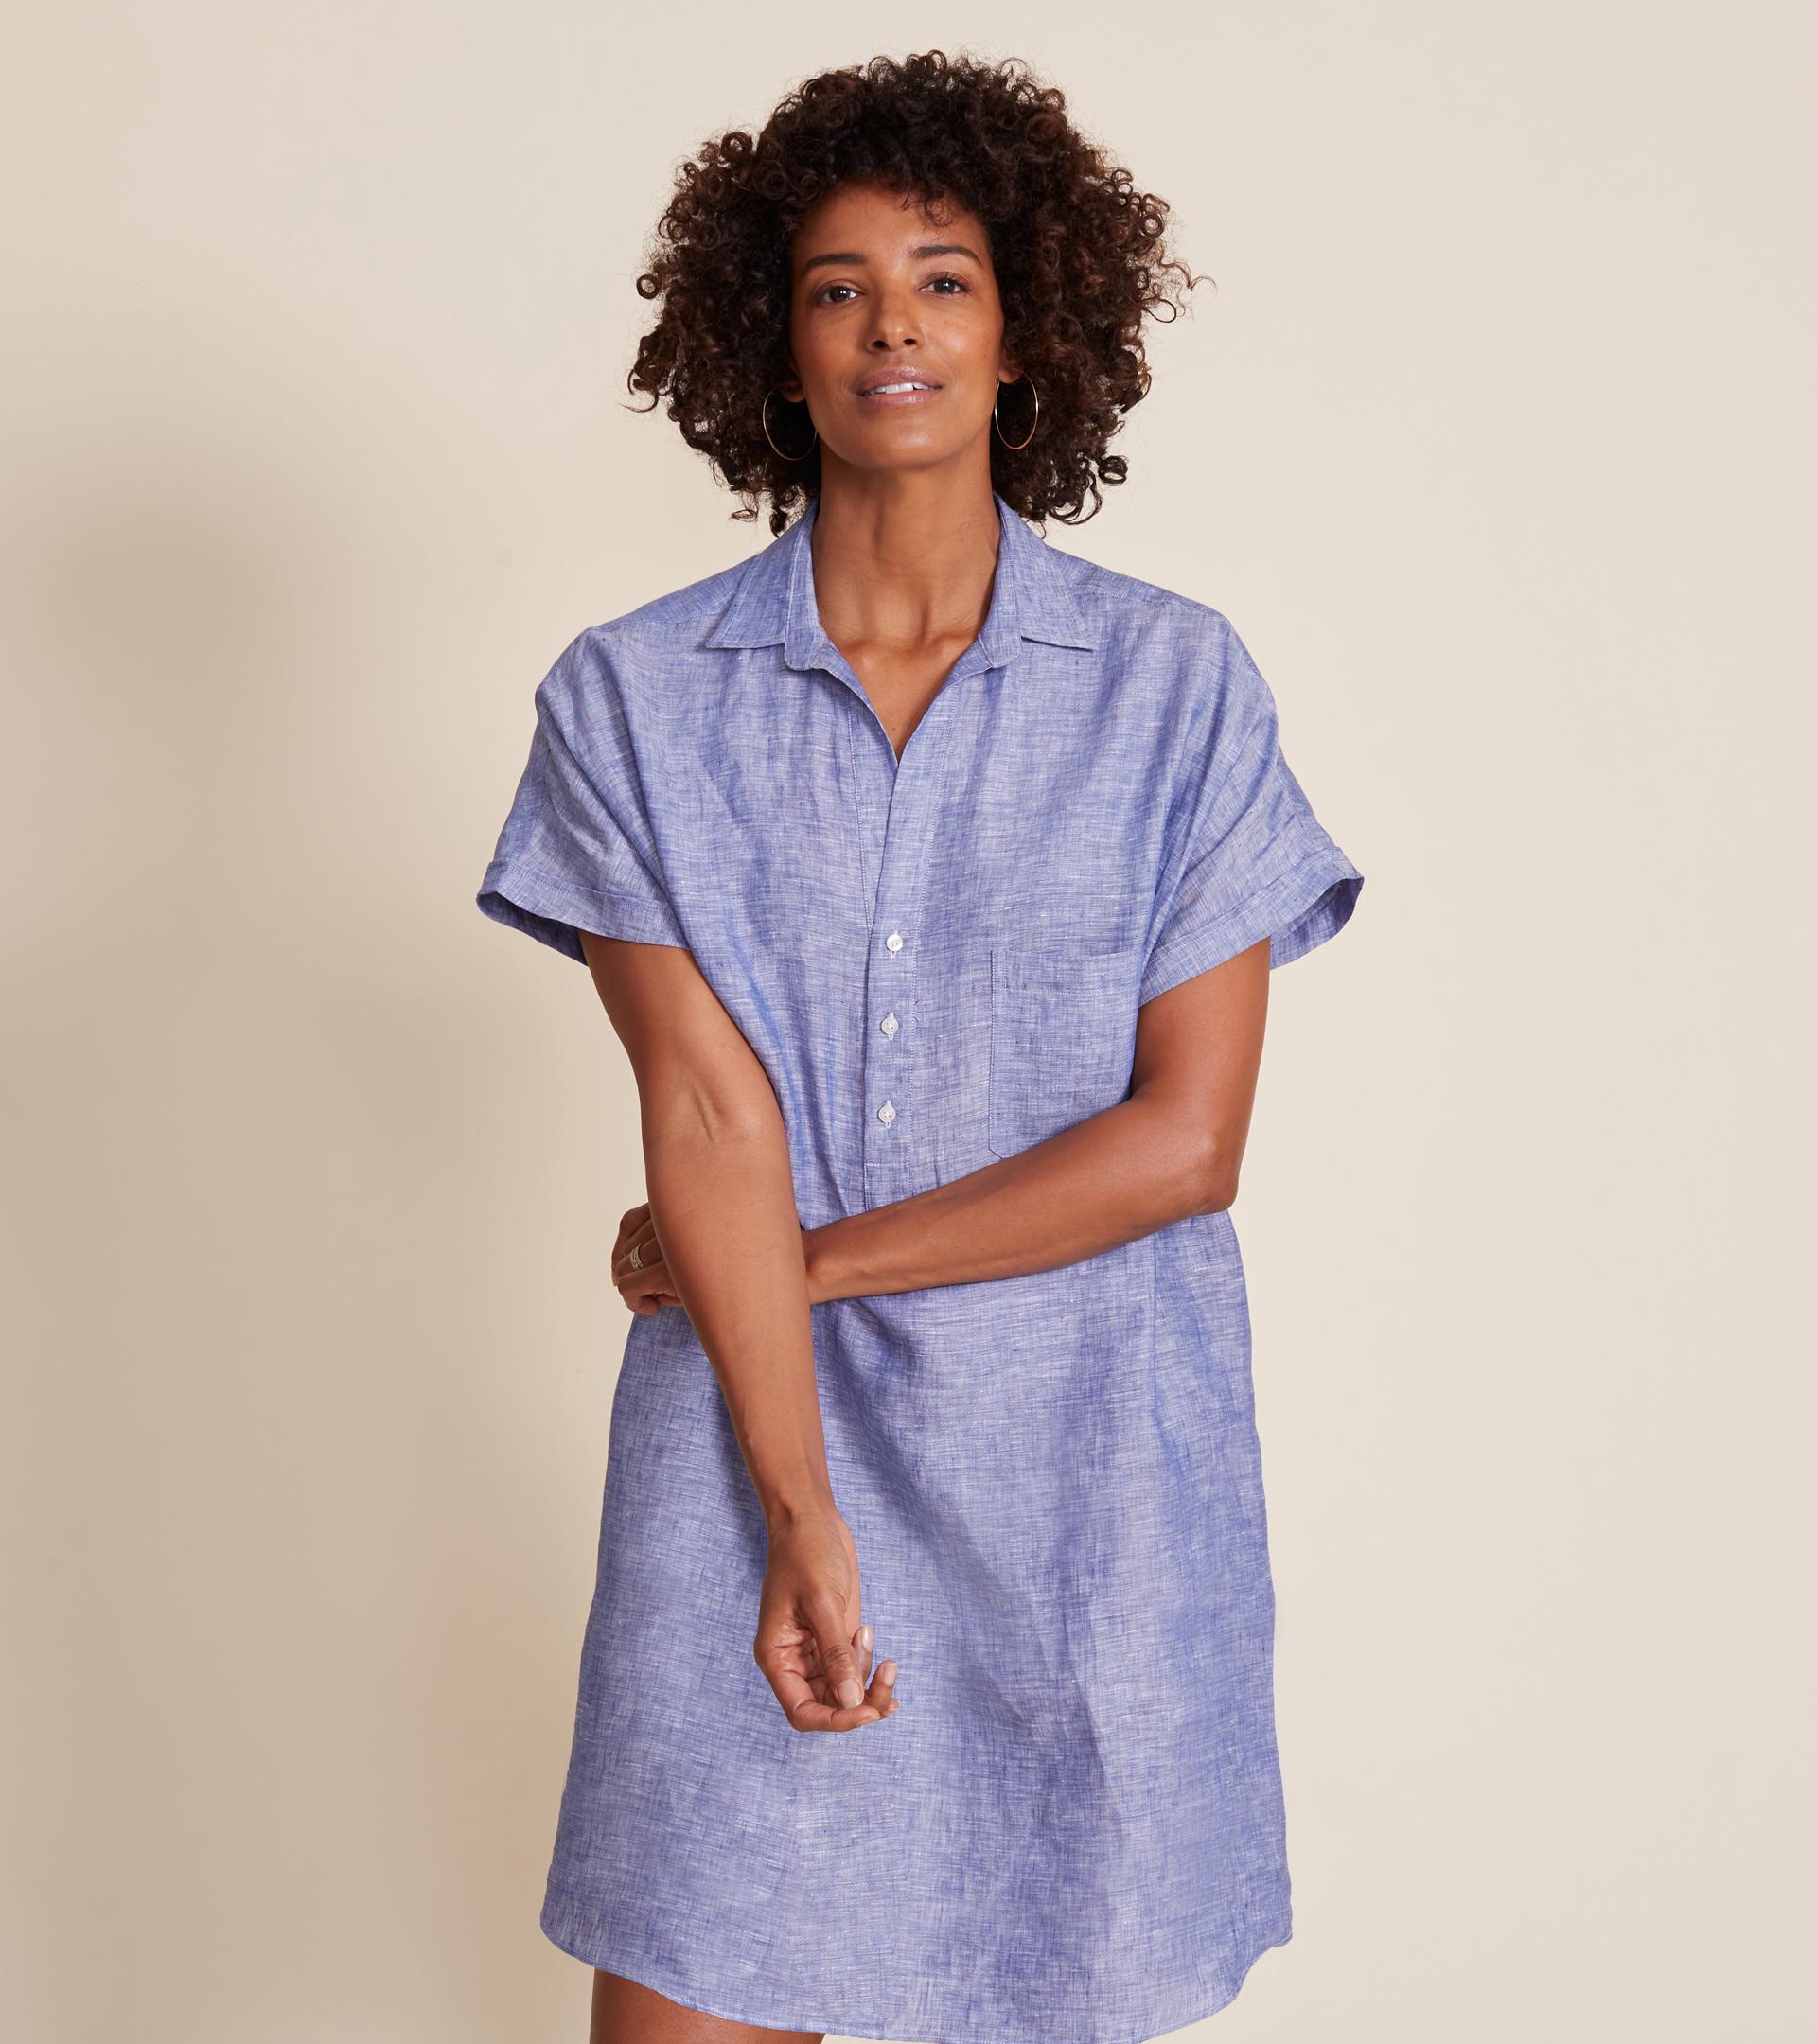 Image of The Artist Short Sleeve Dress Dark Blue, Tumbled Linen Final Sale